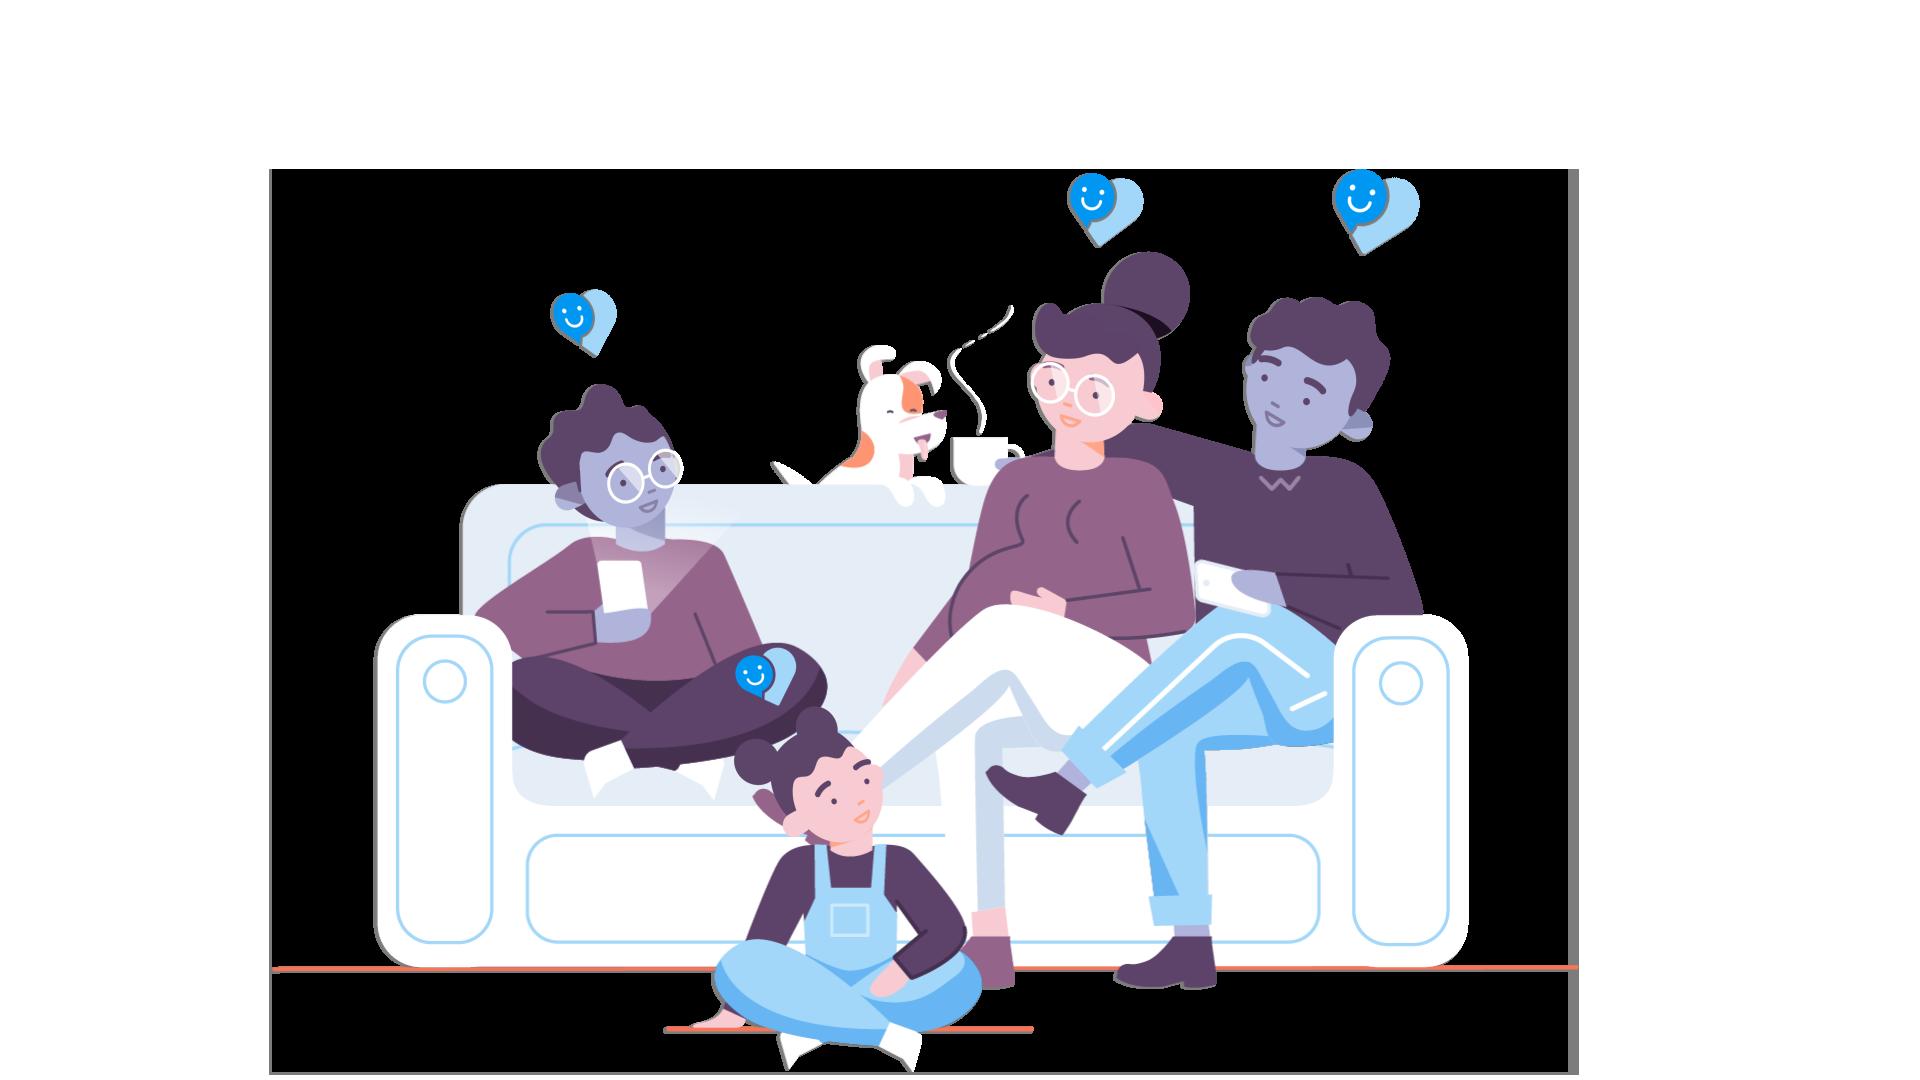 27-Family-on-sofa-transparent-background-1